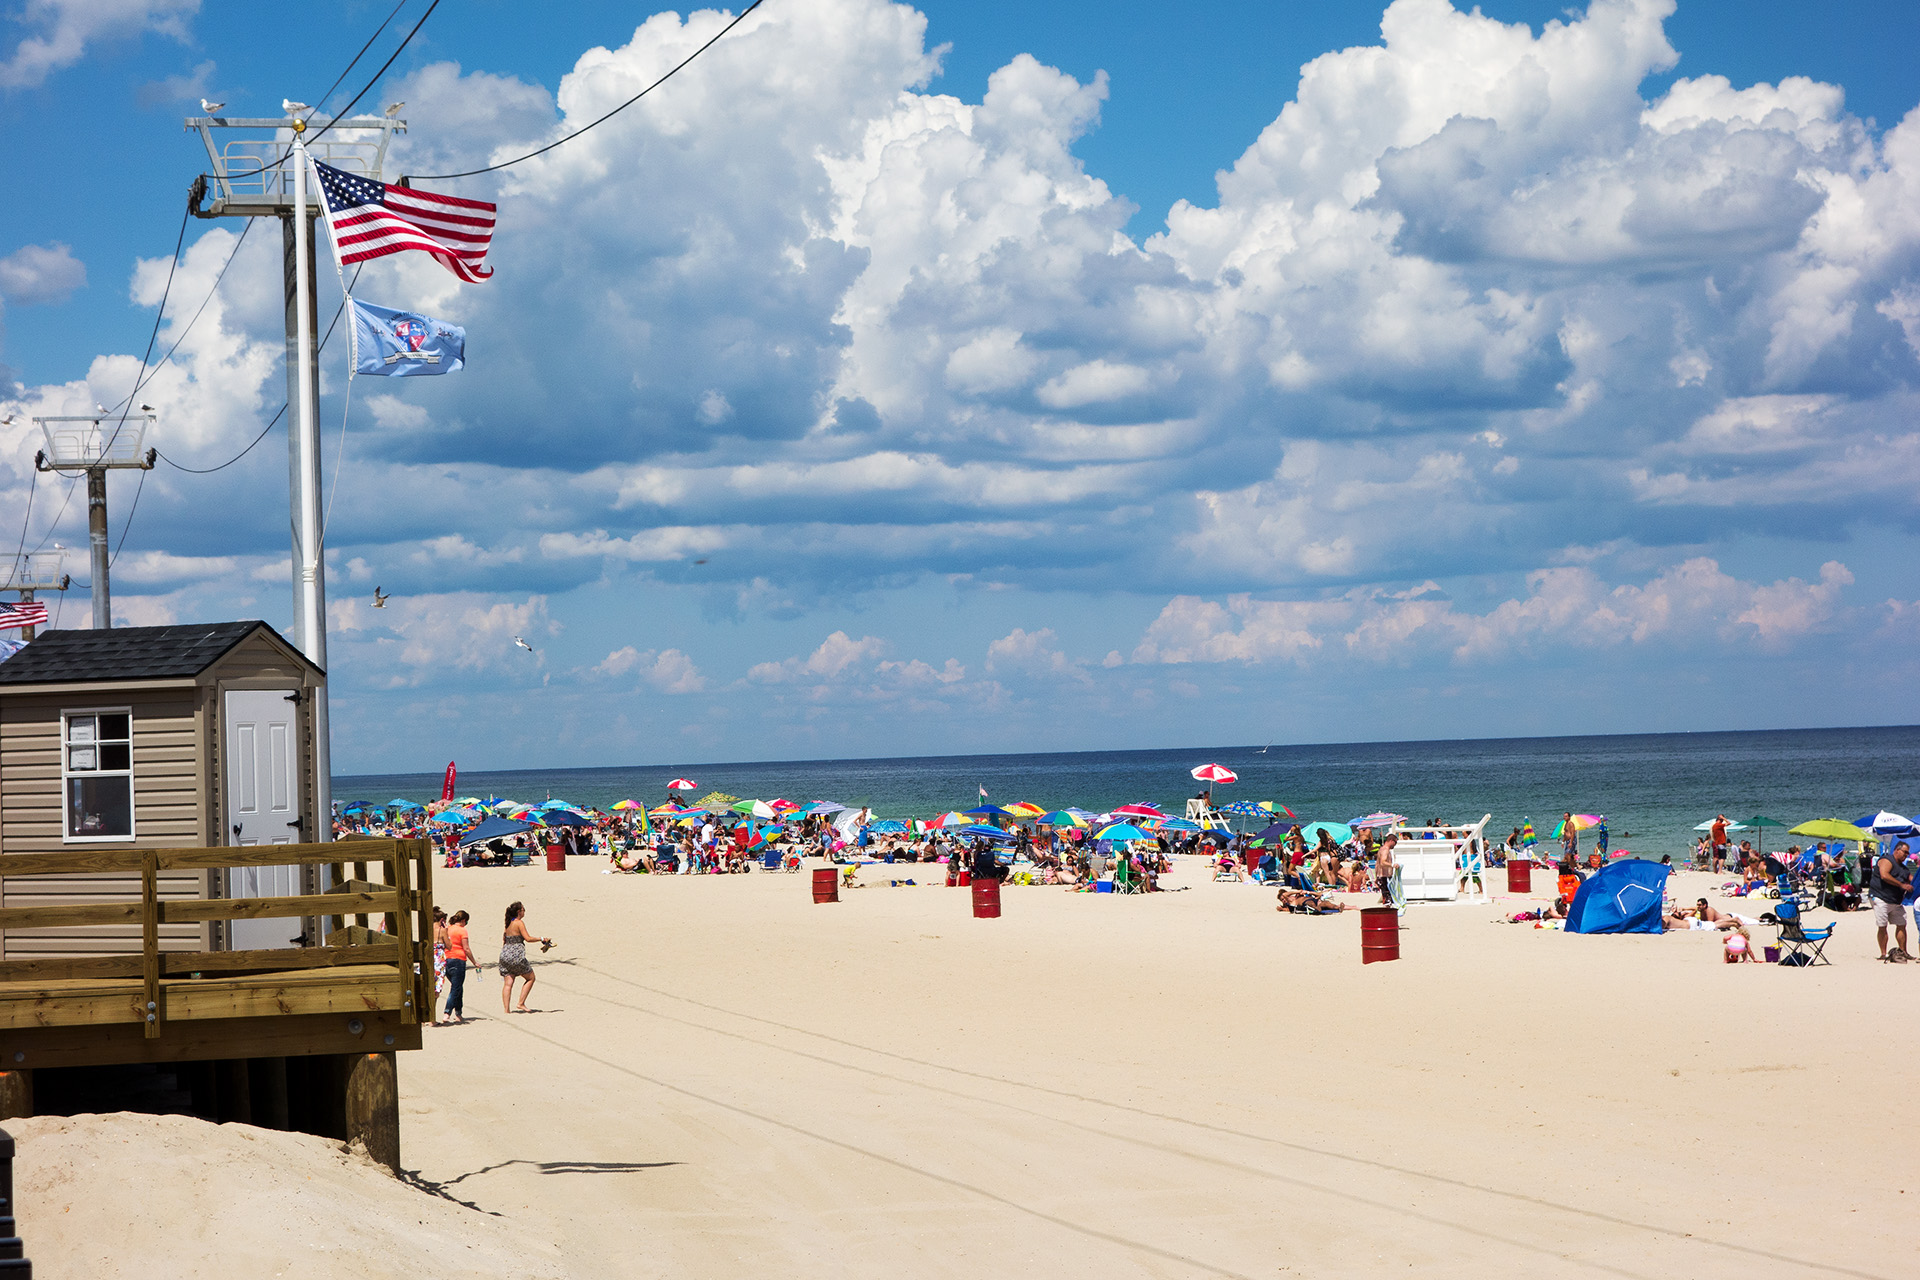 The beach at Seaside Heights, NJ.